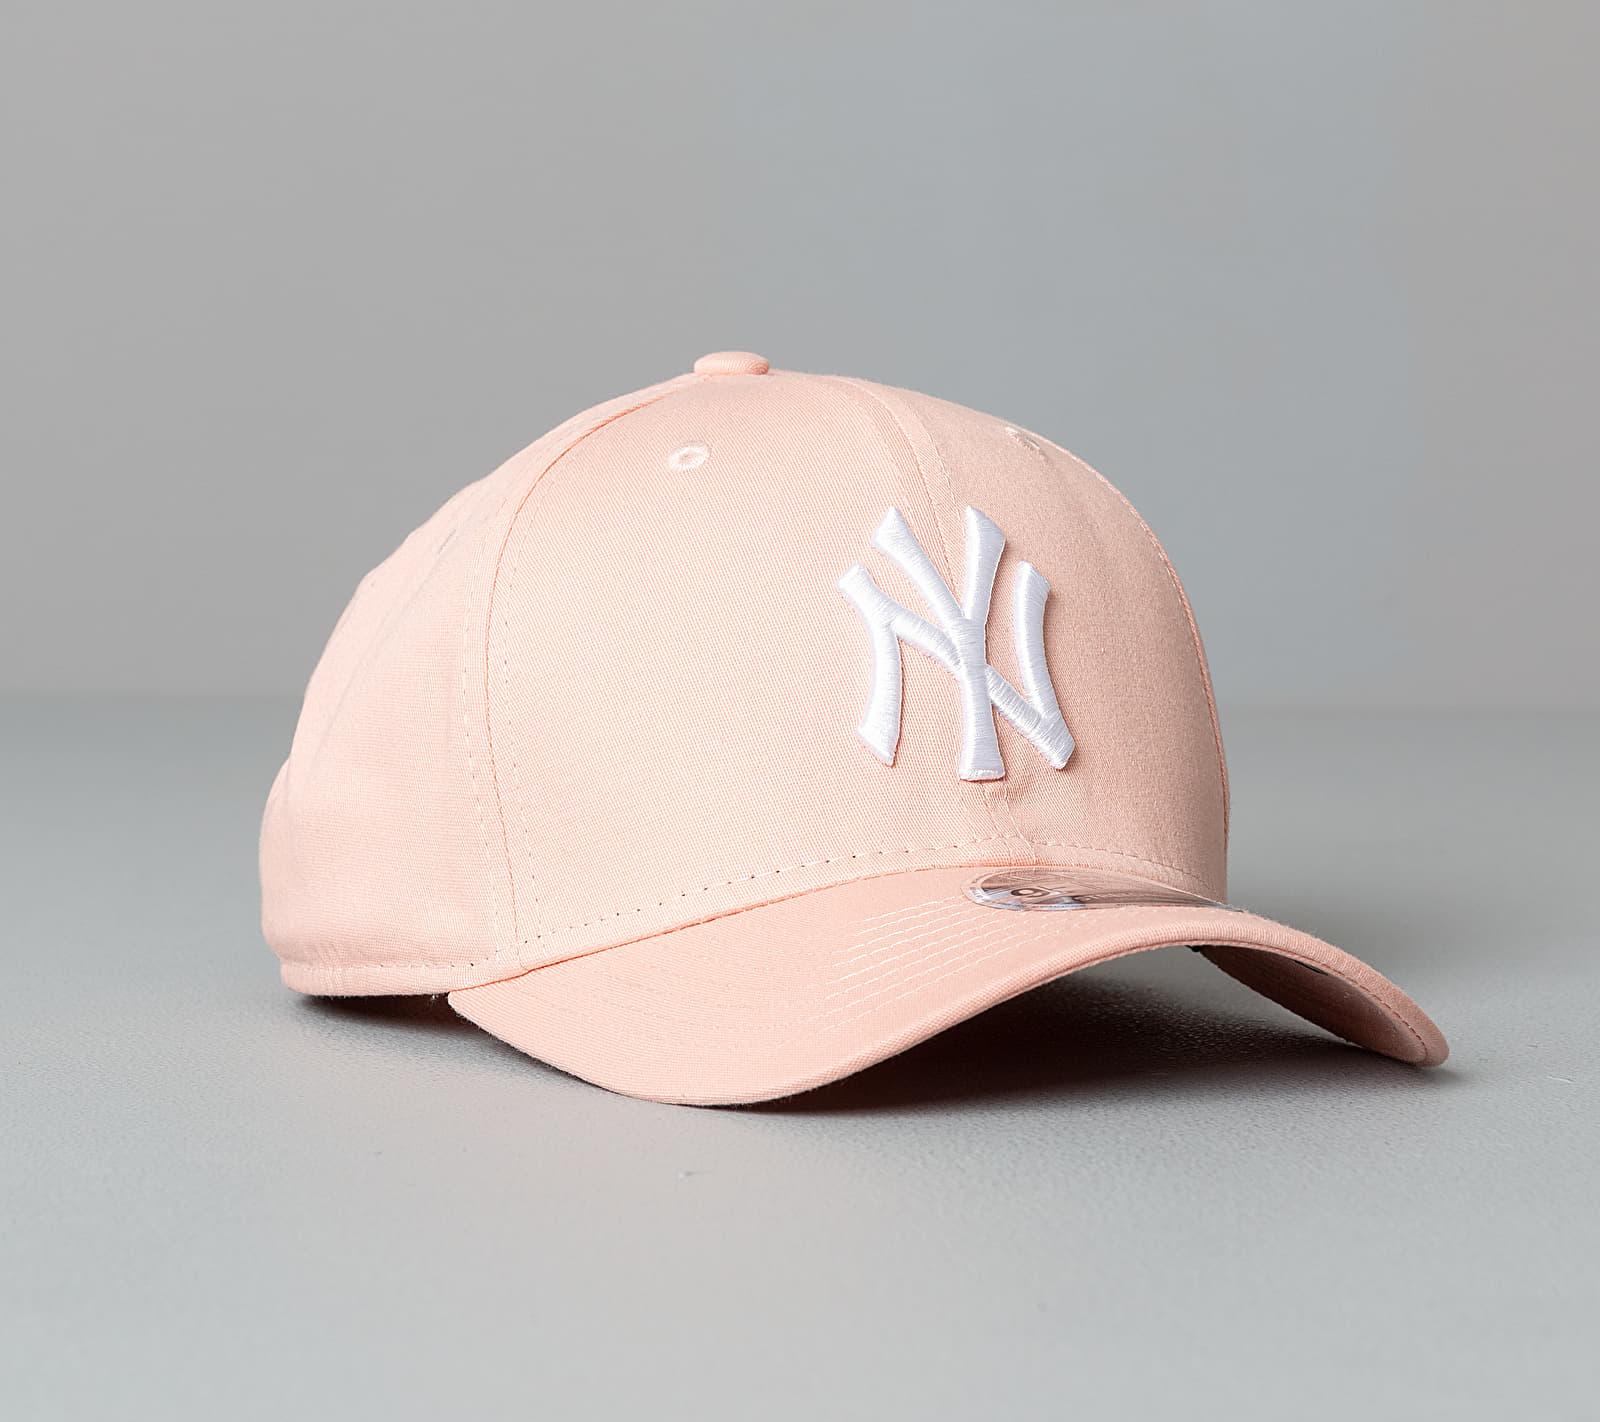 New Era 9Fifty MLB Essentials New York Yankees Cap Pink S/M